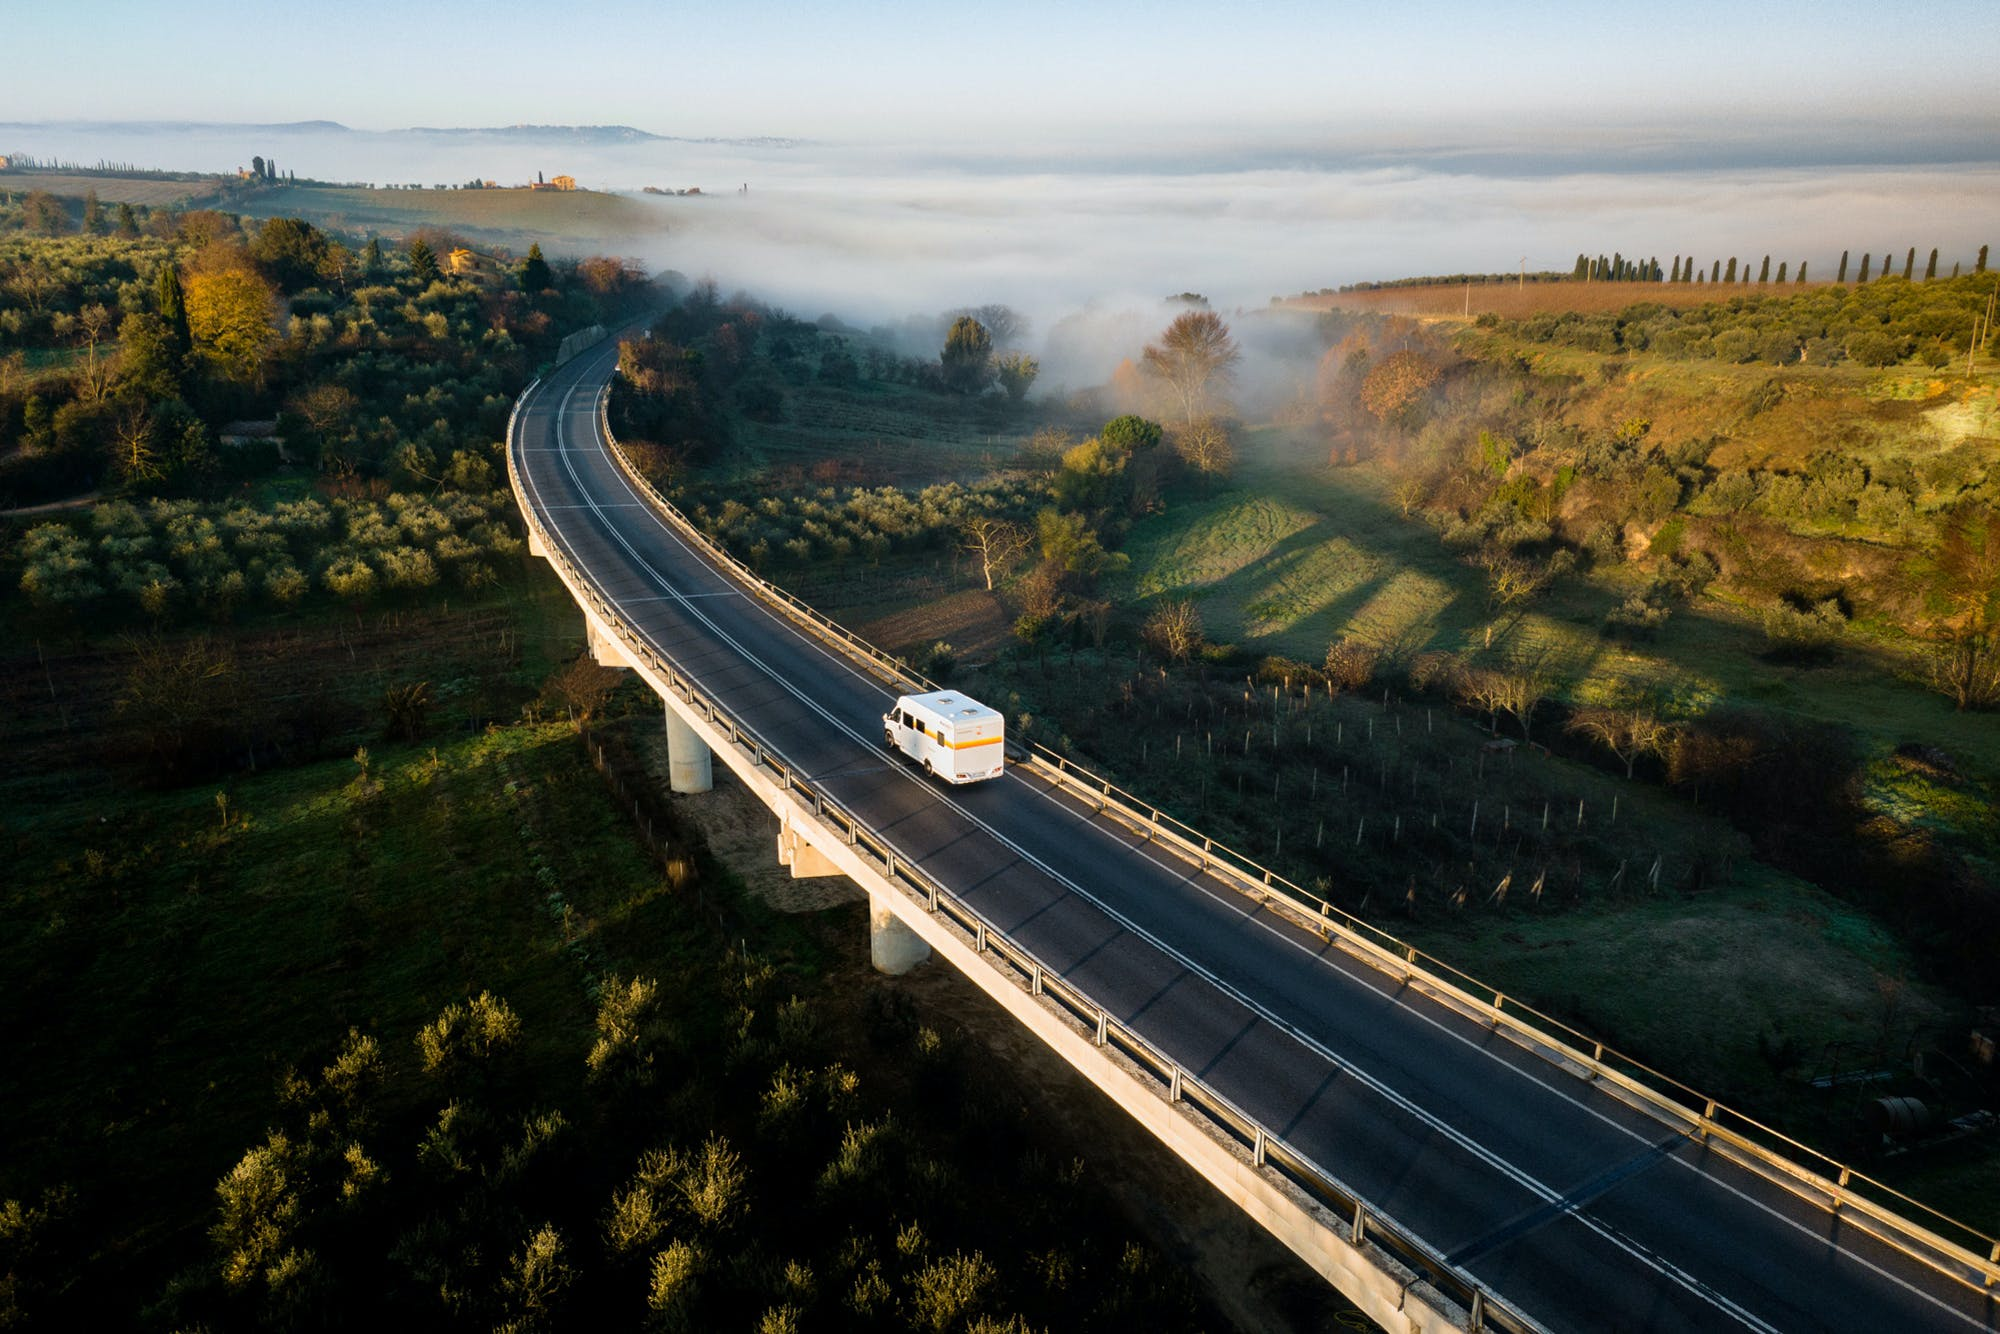 Camper van driving in a highway